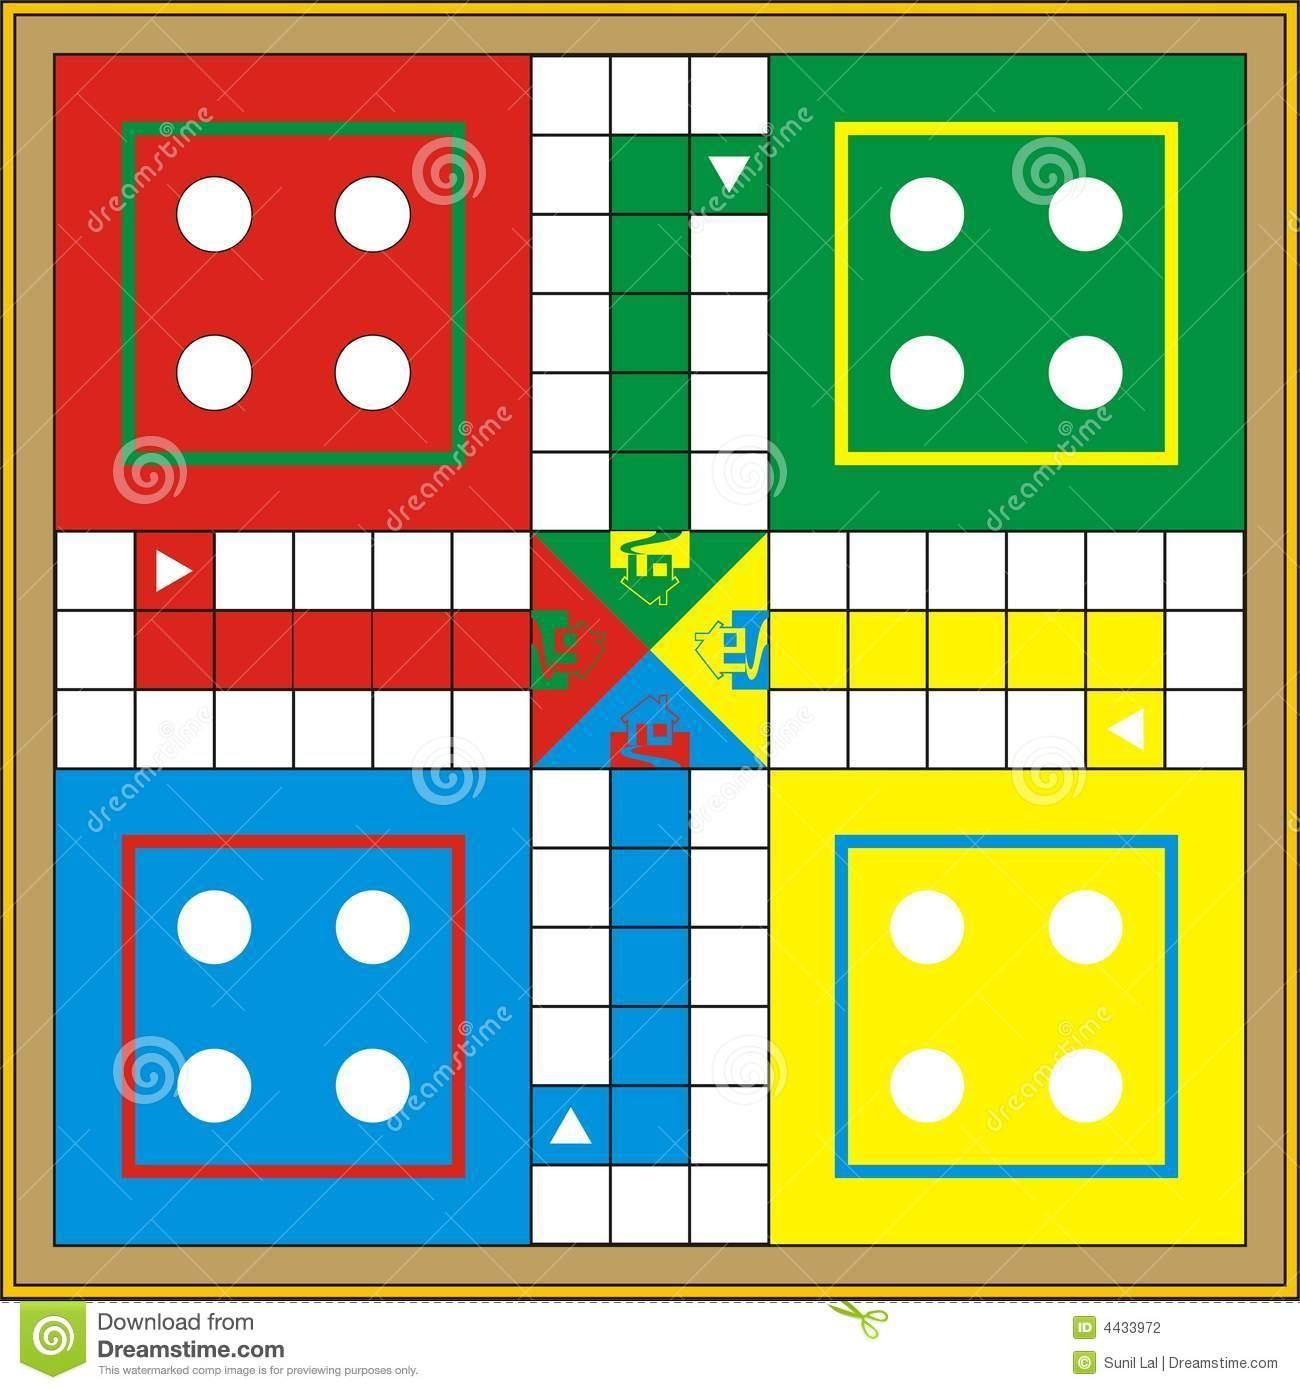 Ludo-Print & Gift Or Play Stock Illustration. Illustration Of - Free Printable Ludo Board